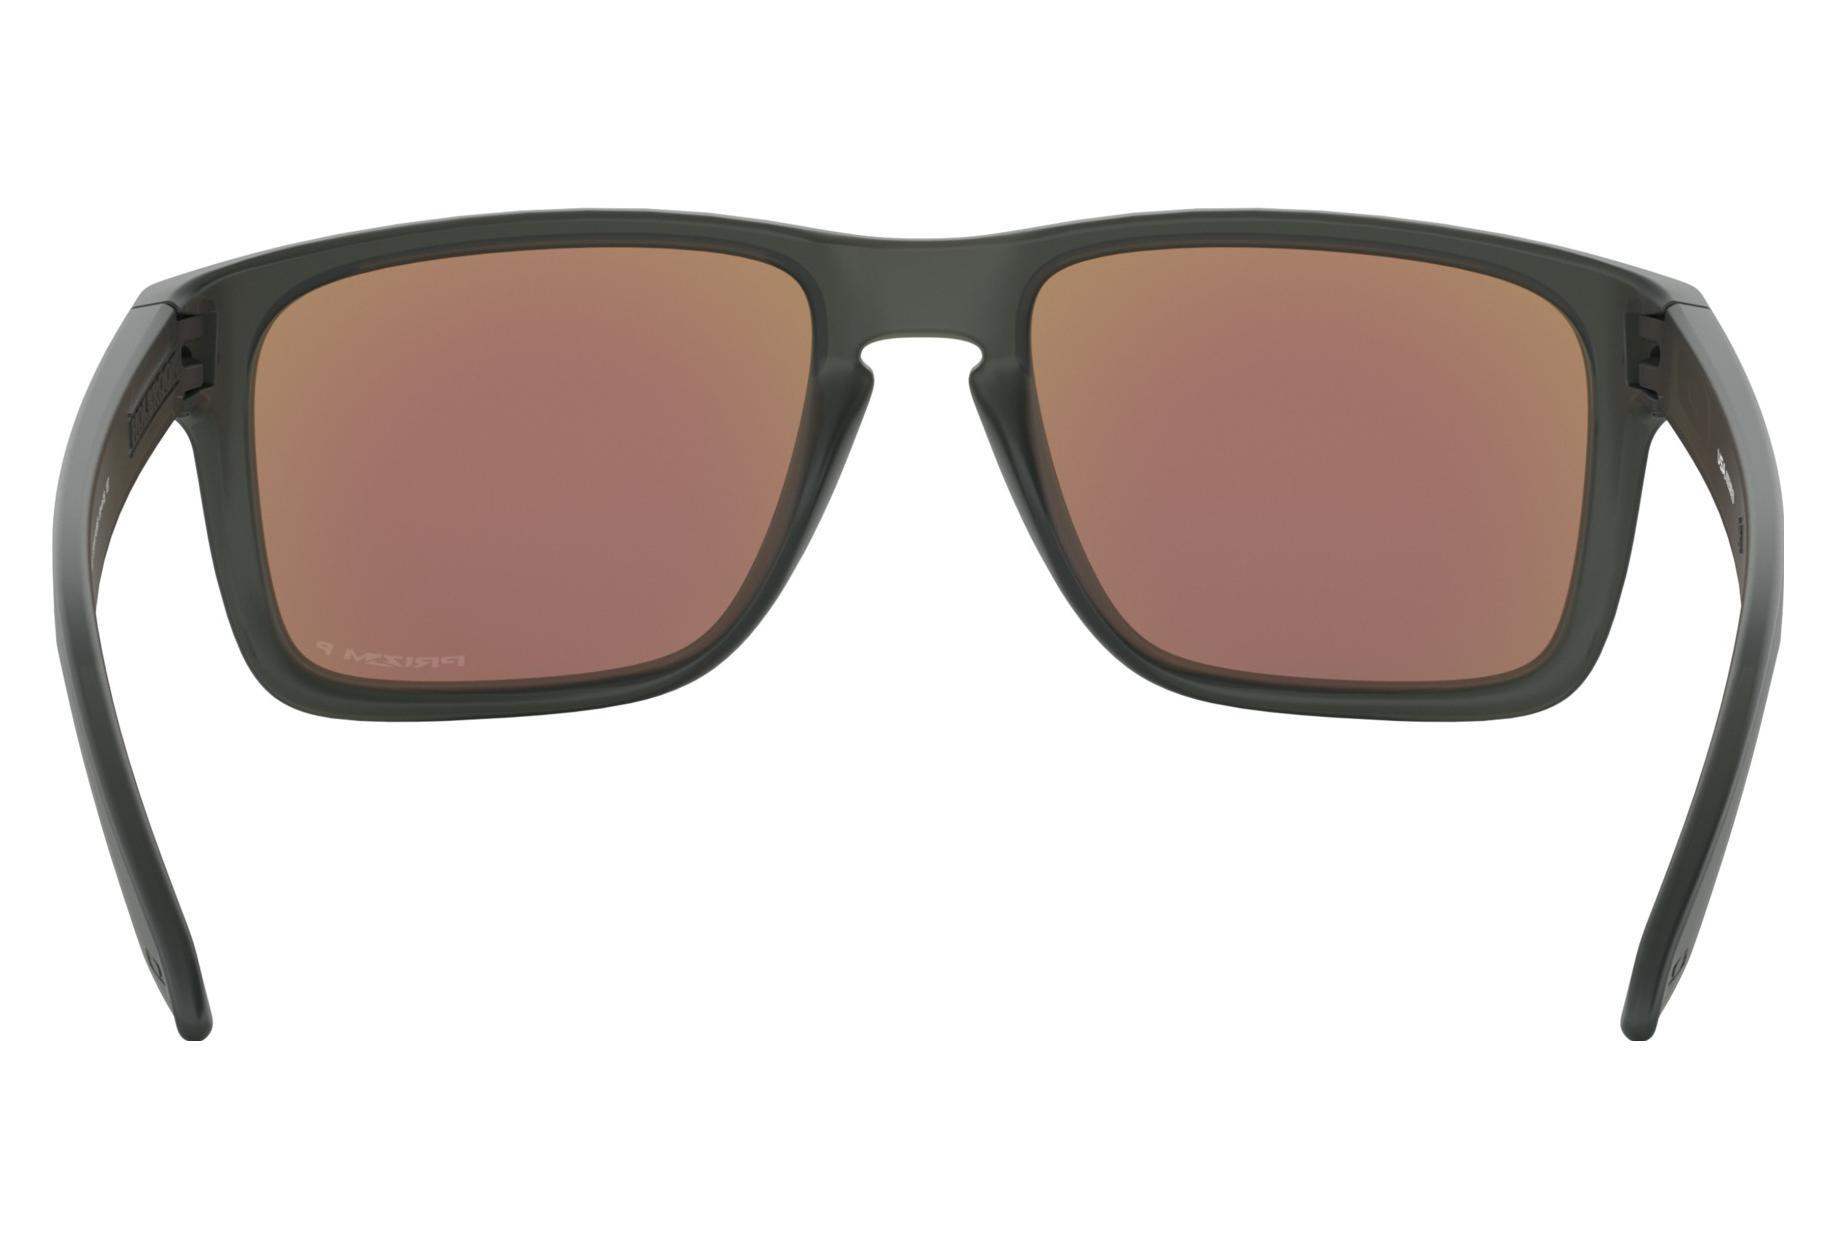 c087a6a6cc Oakley Sunglasses Holbrook XL Prizm Sapphire Polarized Collection Gray Smoke    Prizm Sapphire Polarized   Ref